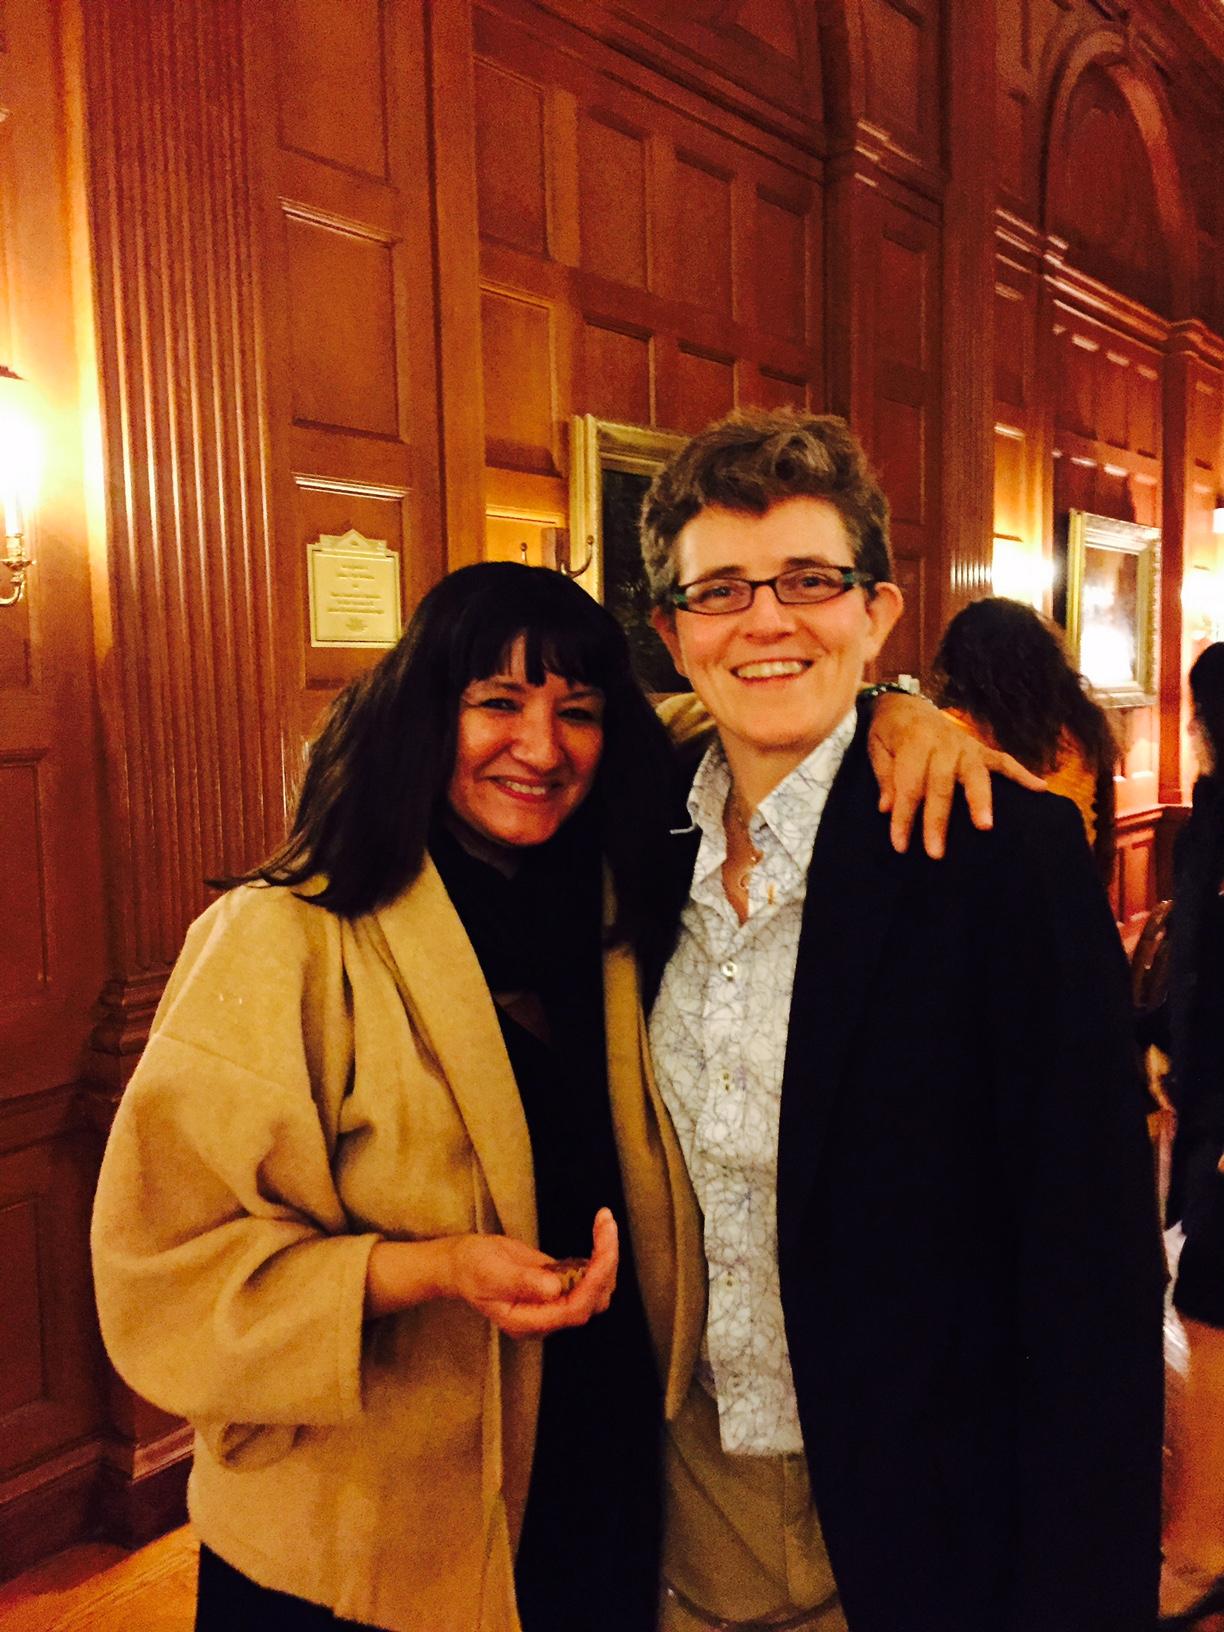 Sandra Cisneros wraps her arm around the LSP Founding Director María DeGuzmán. Fall 2014.